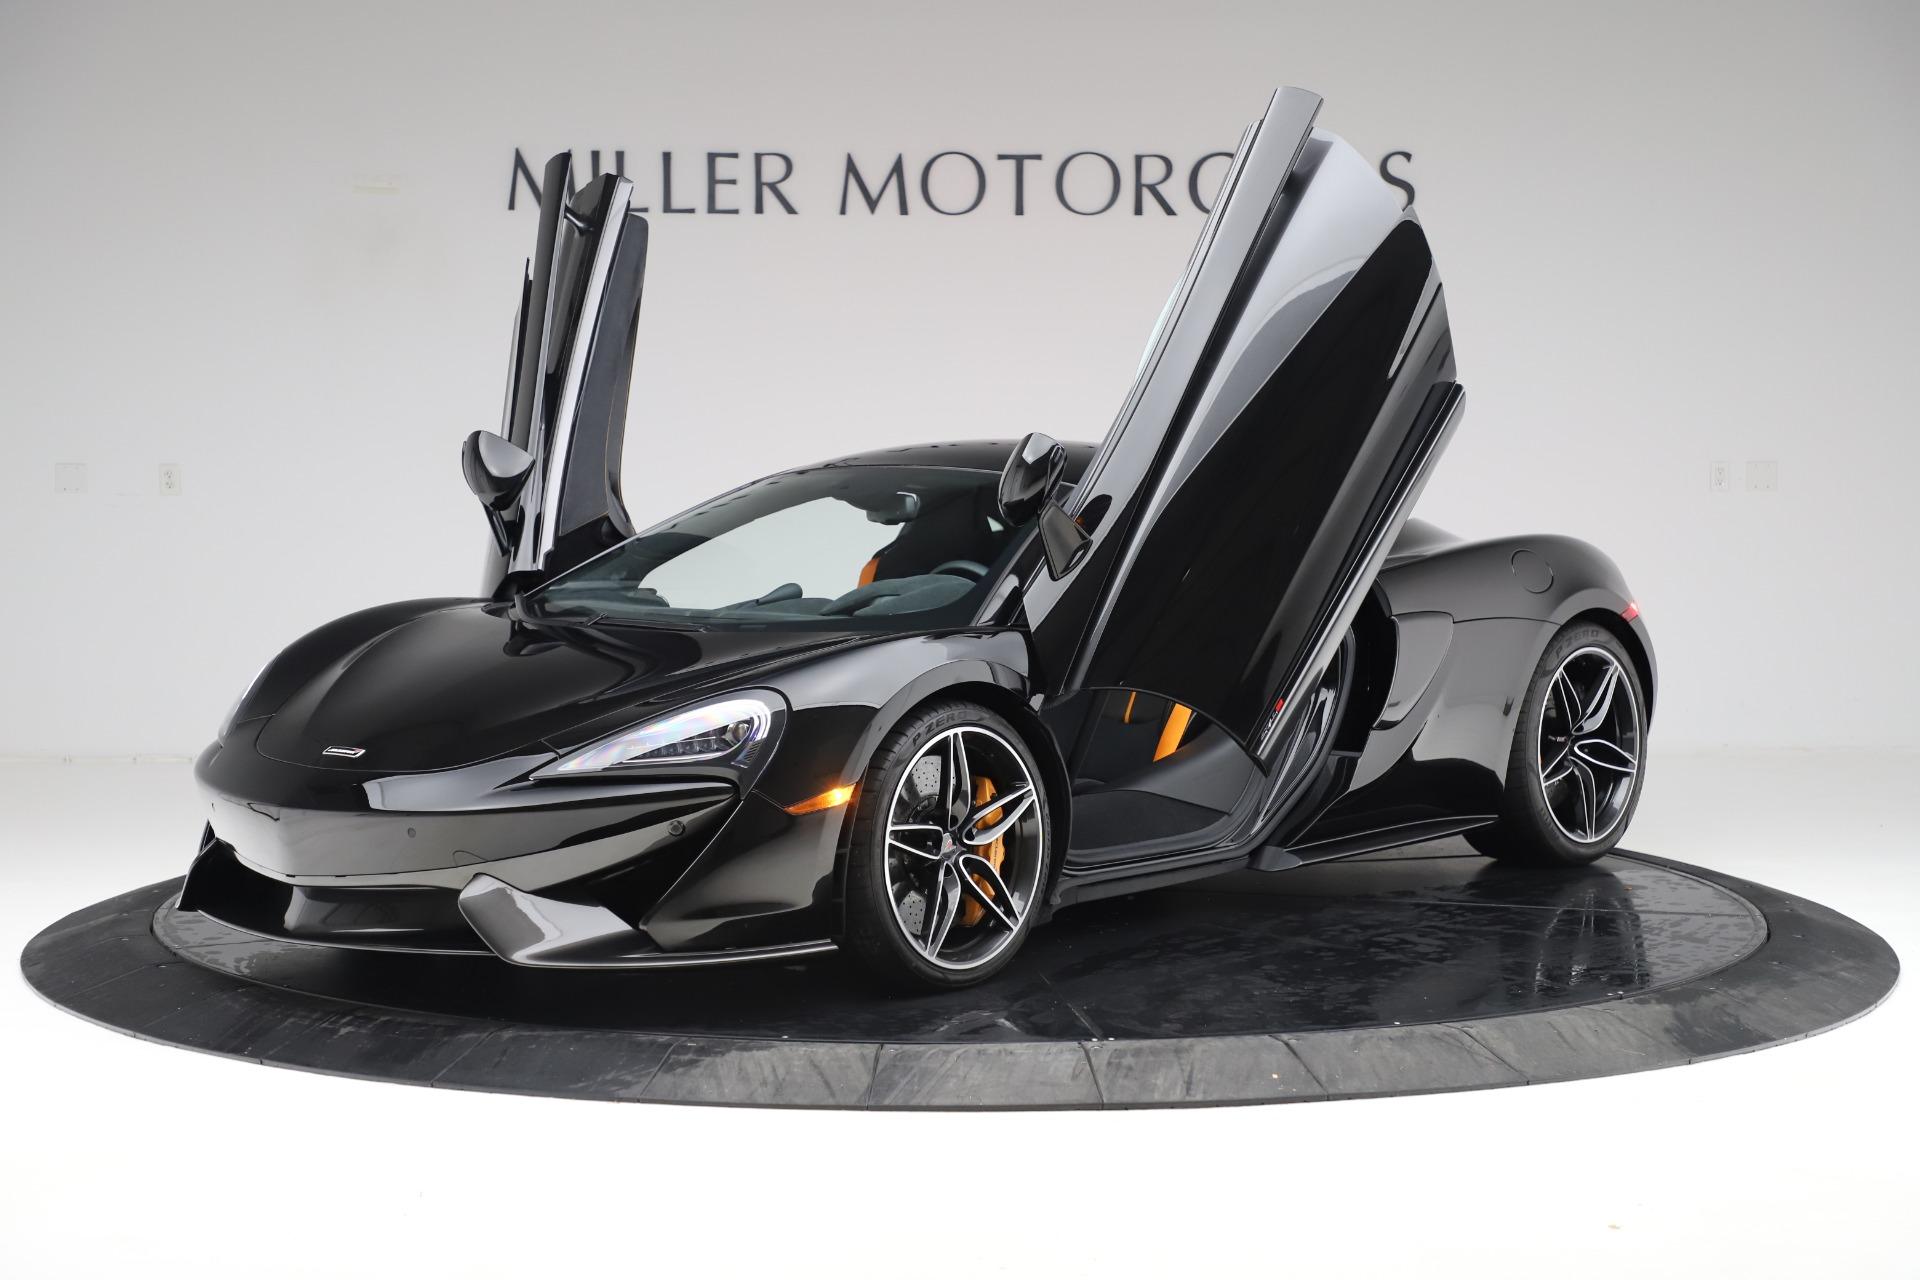 Used 2017 McLaren 570S Coupe For Sale In Westport, CT 3503_p13